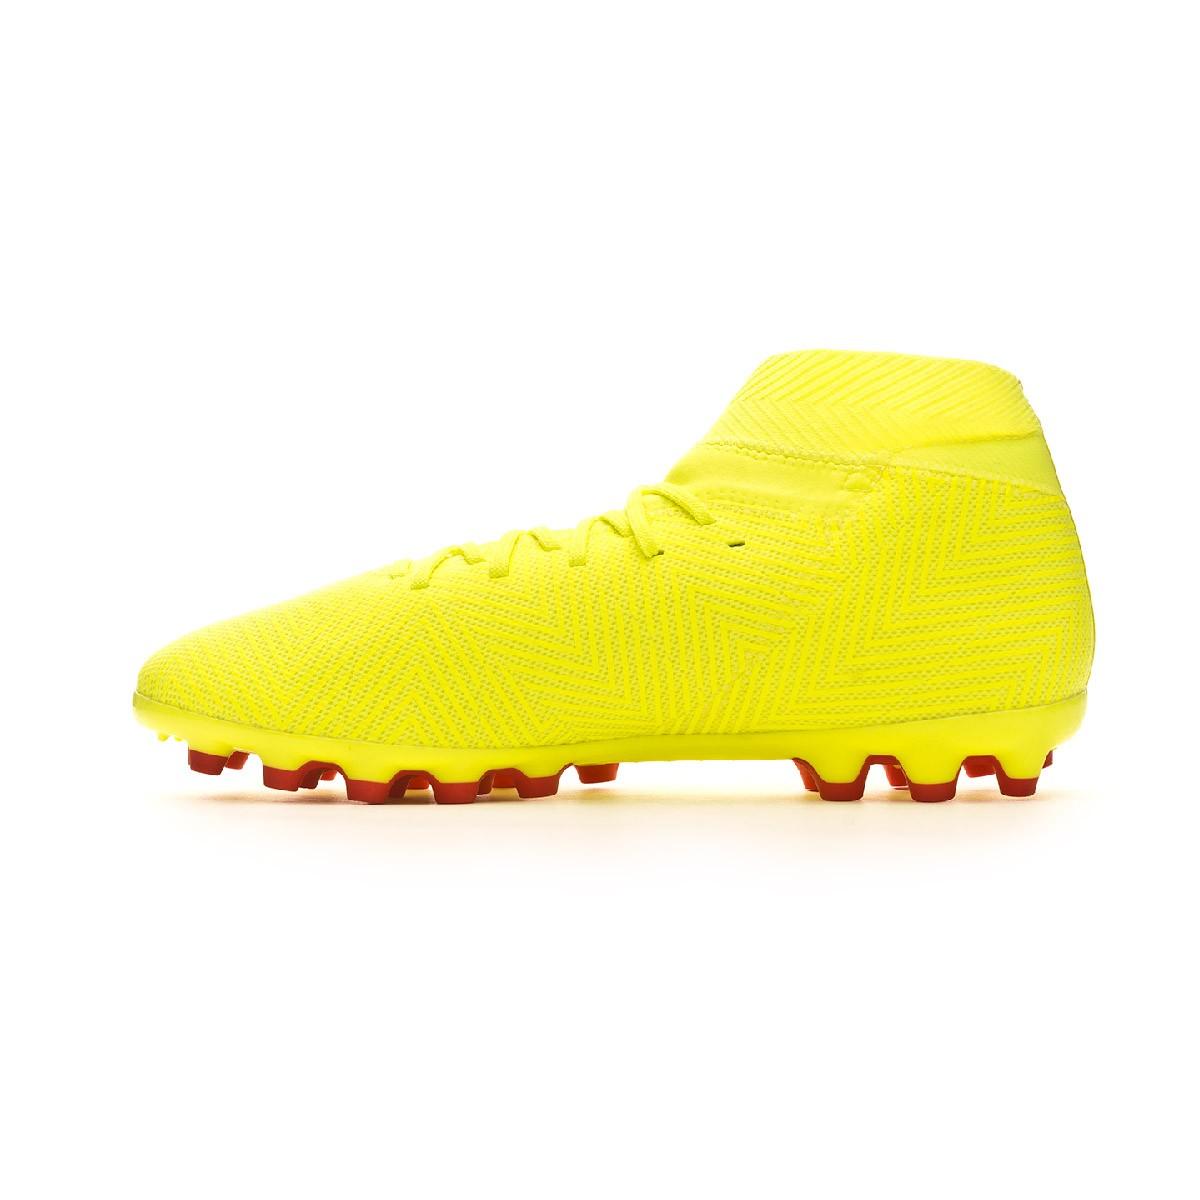 b803bd041821 Football Boots adidas Nemeziz 18.3 AG Solar yellow-Football blue-Active red  - Football store Fútbol Emotion